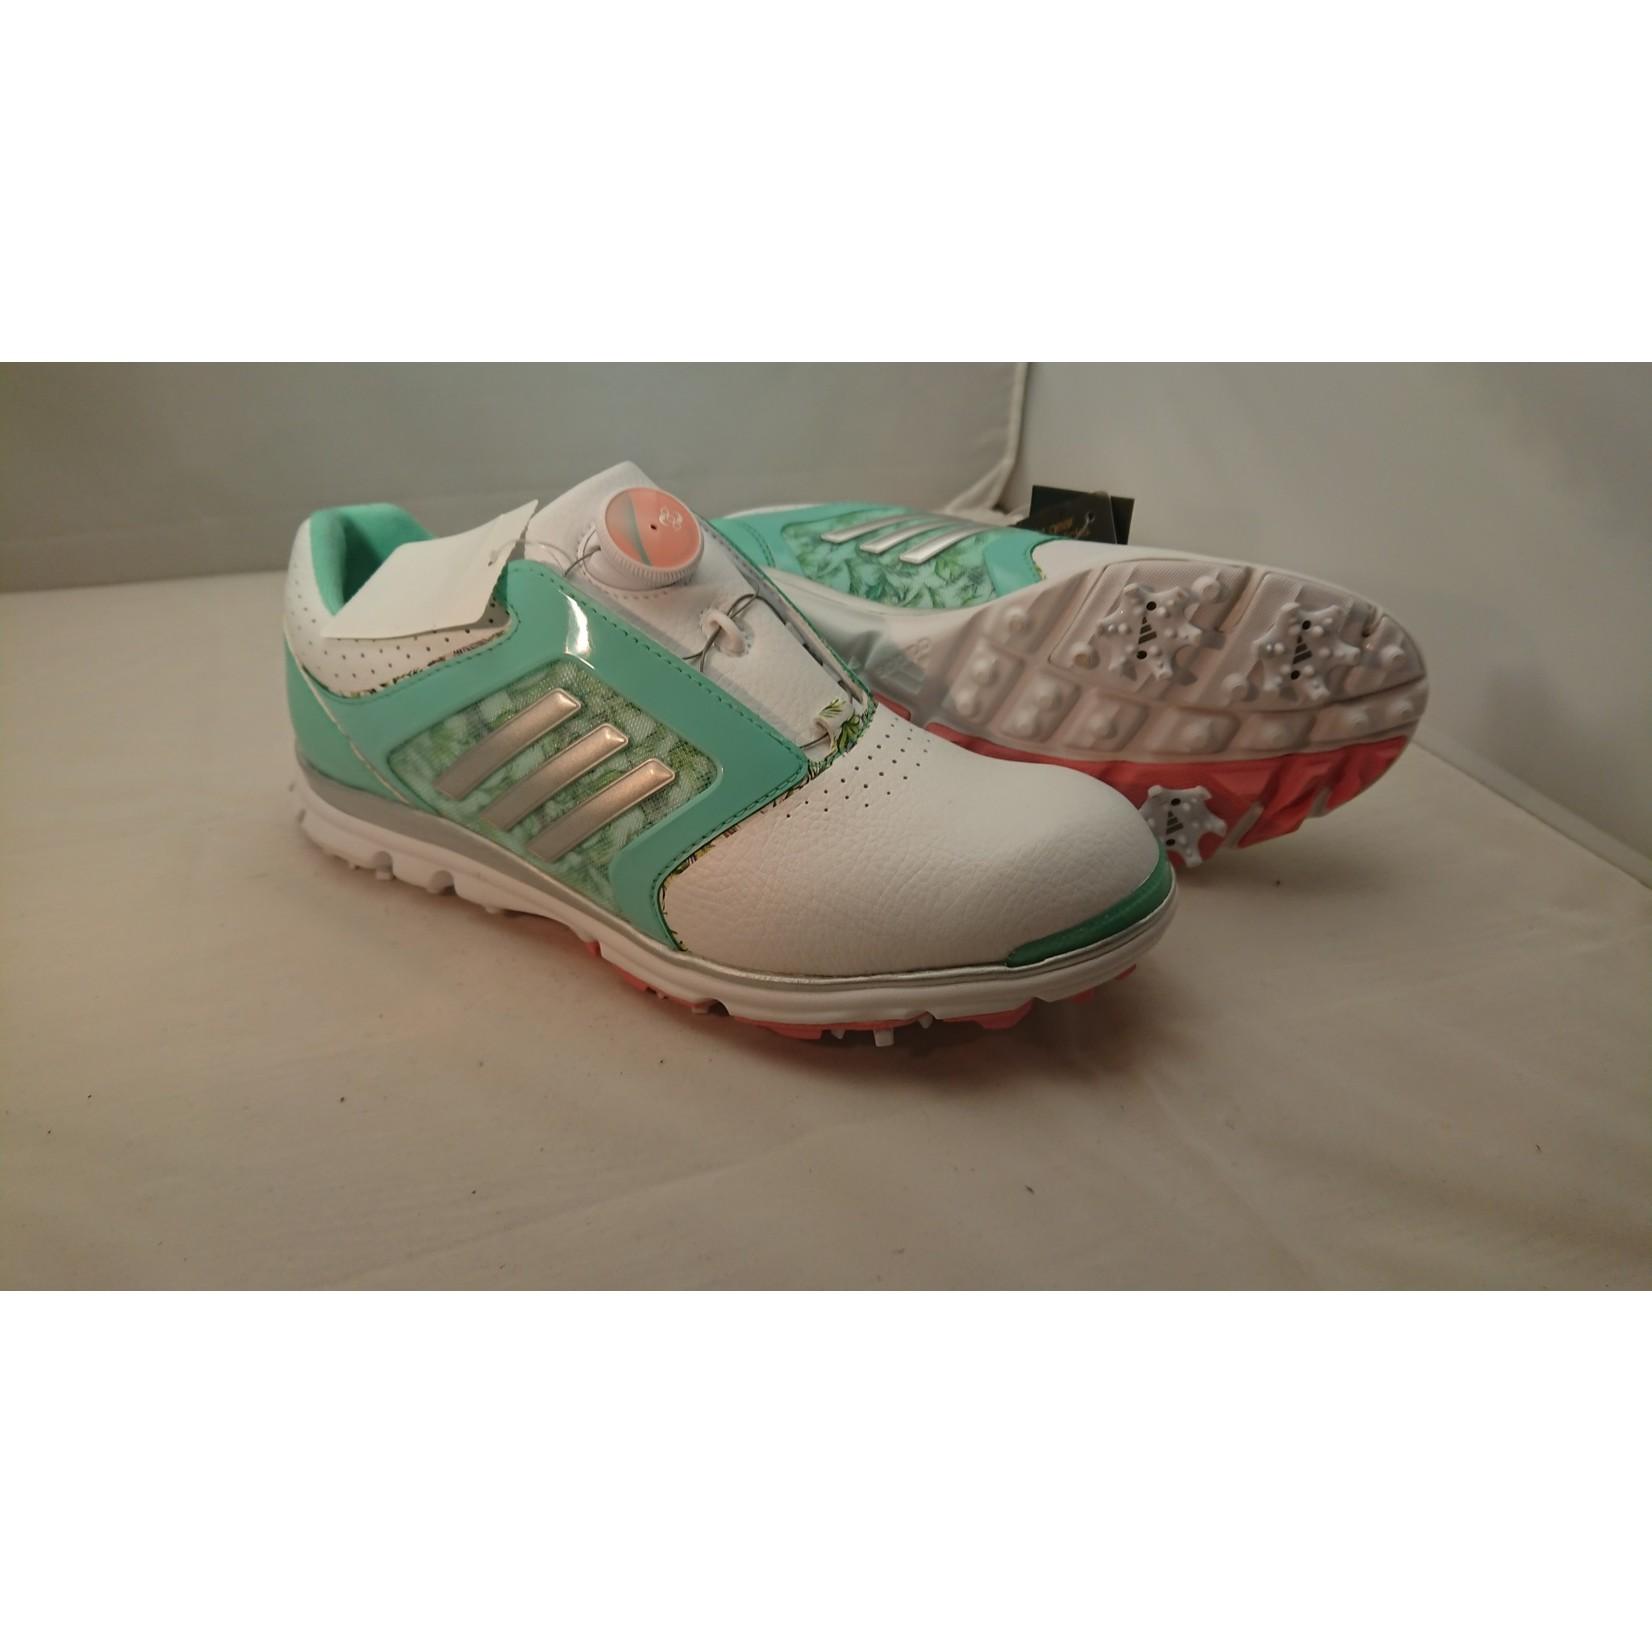 Adidas Adidas adistar tour Boa Wit/Groen 38 2/3